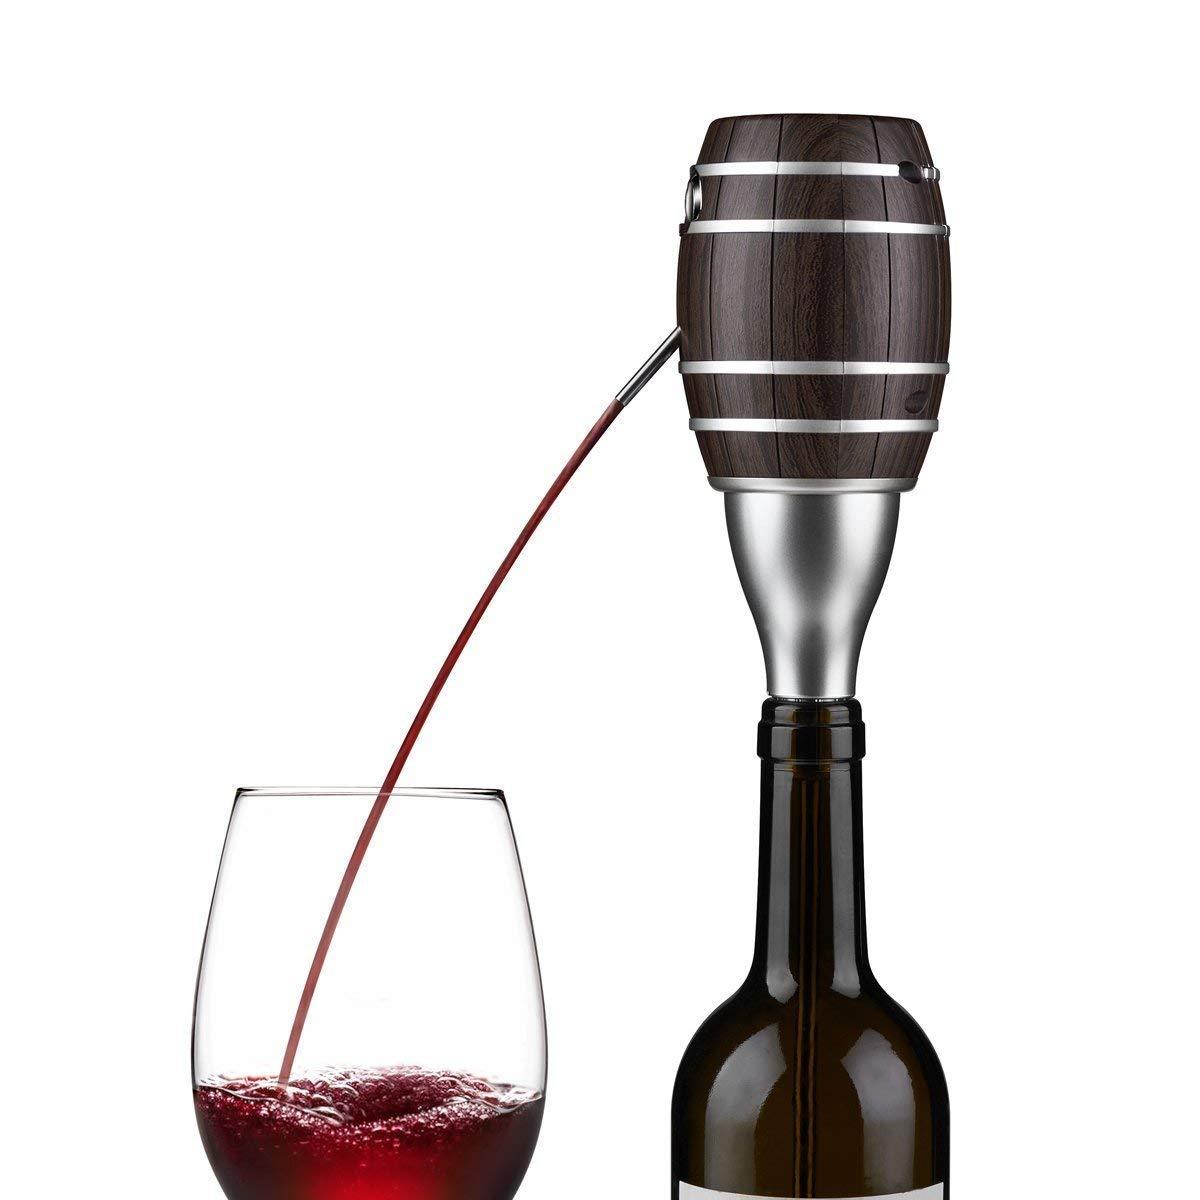 Farway Wine Dispenser Electric Smart Wine Decanter 6 Seconds Fast Sobering Telescopic Suction Pipe Barrel-shape